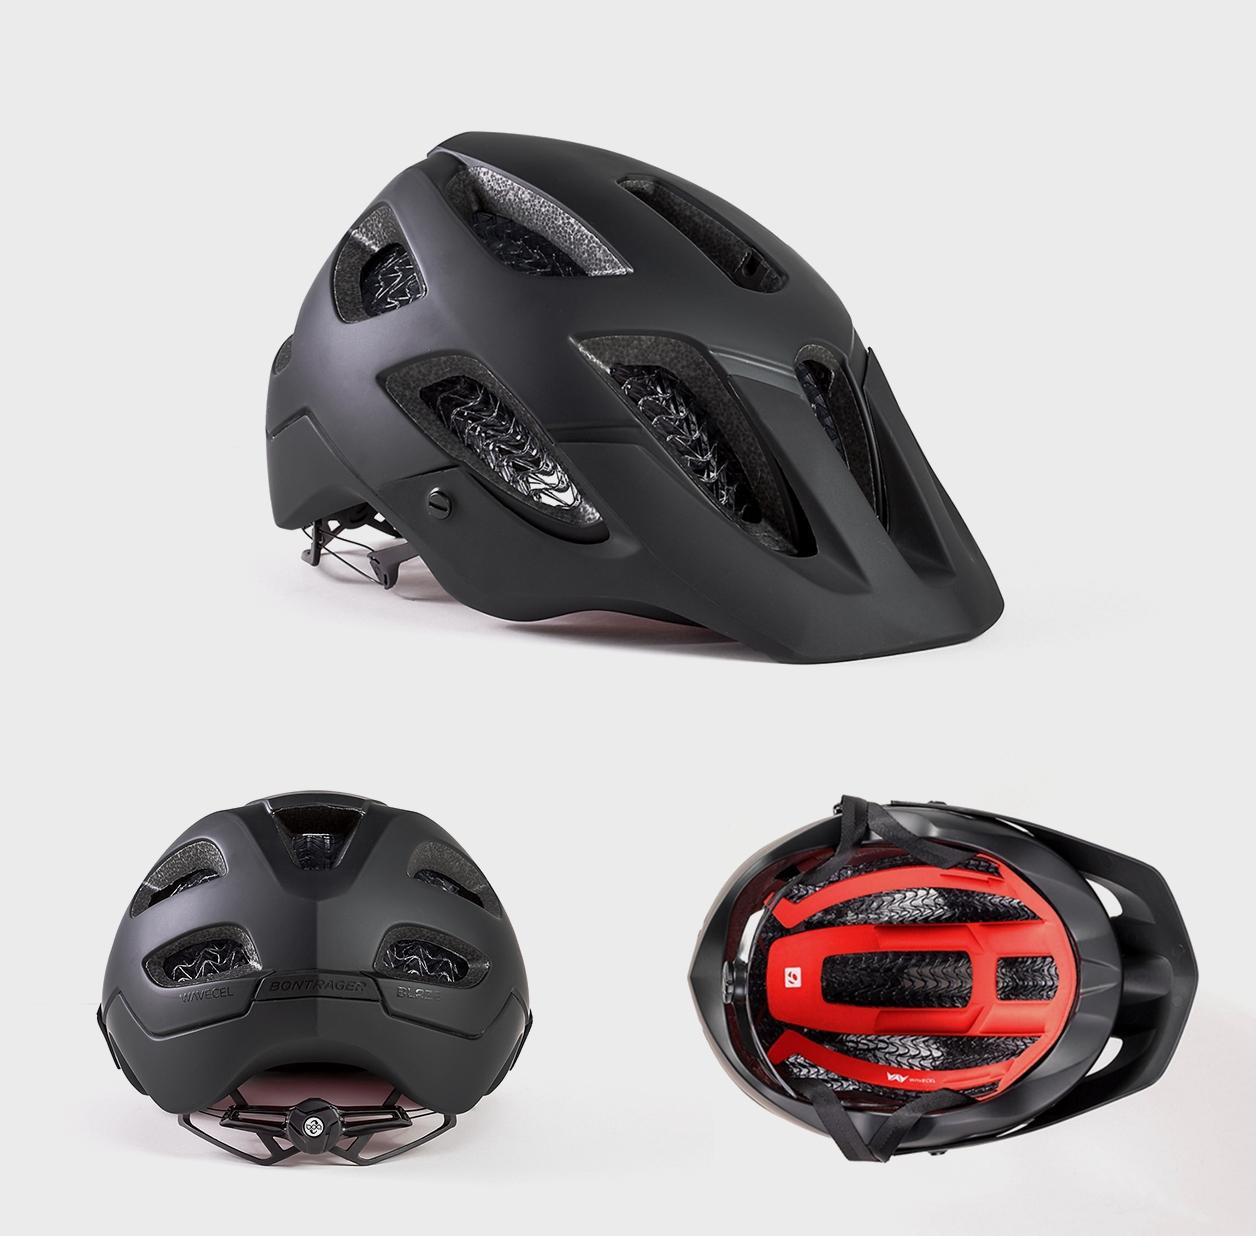 Outville_Mountainbike Produkte_Bontrager Blaze Wavecell